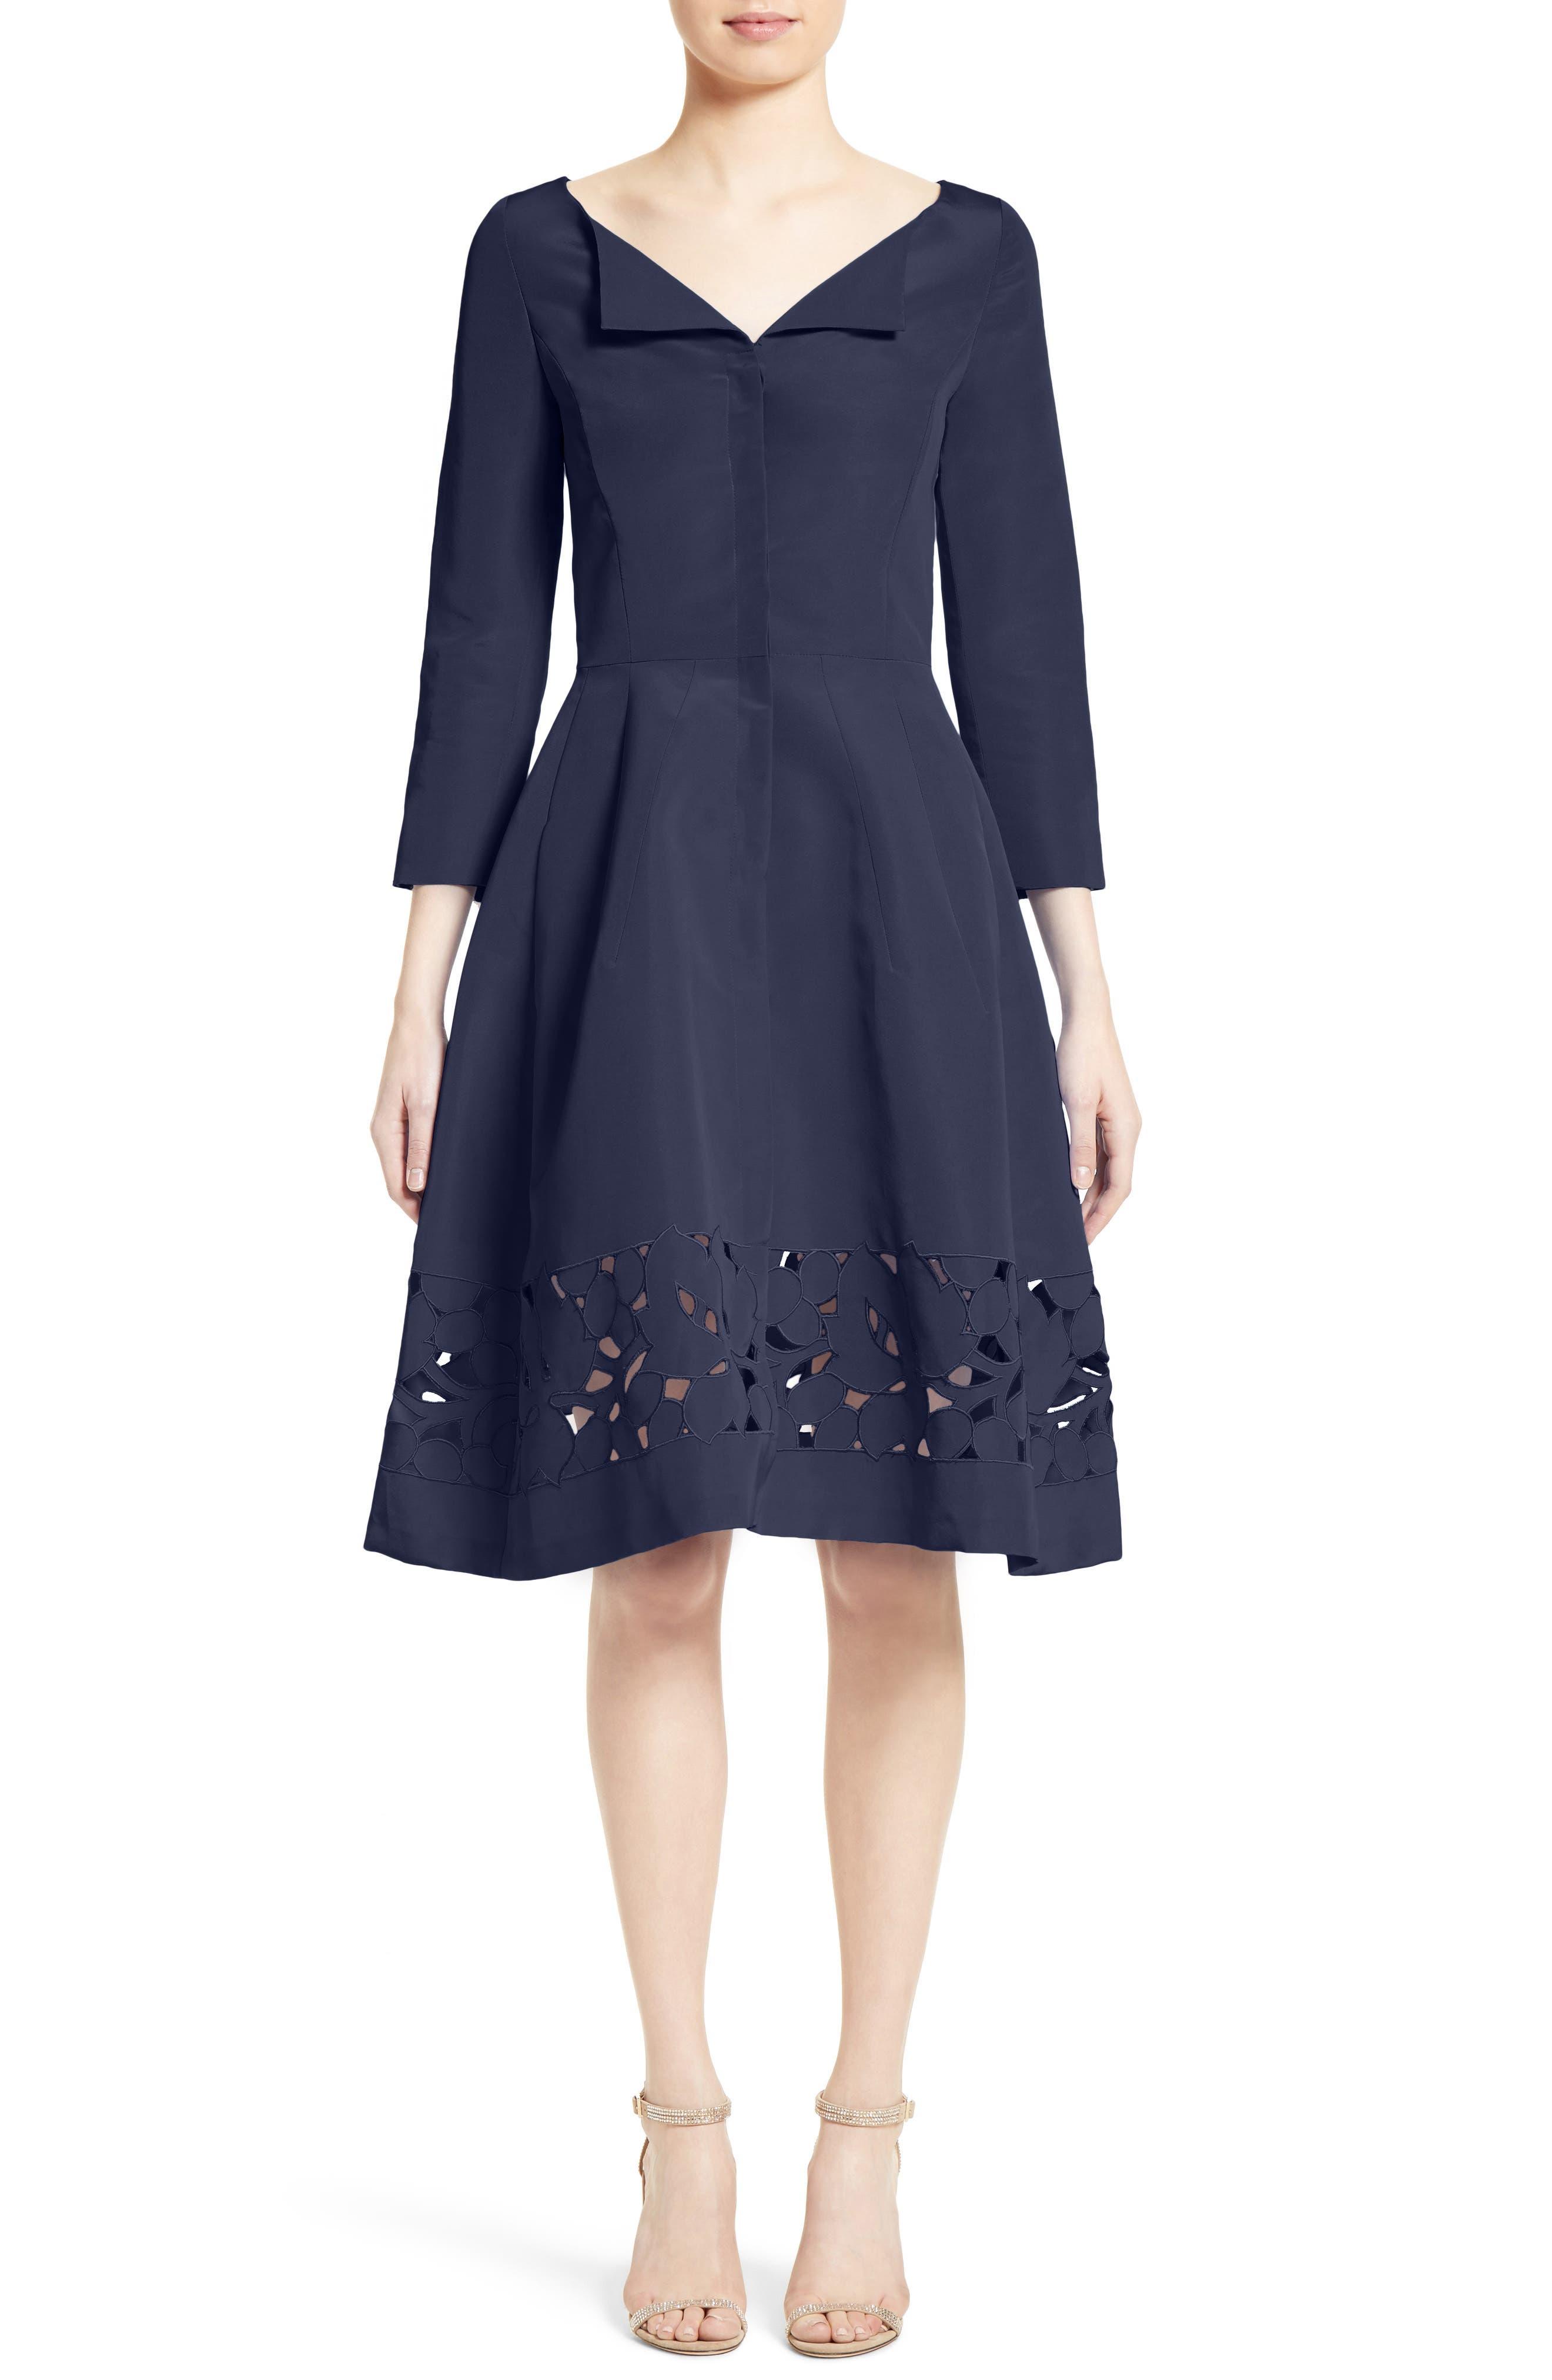 Carolina Herrerra Laser Cut Eyelet Button Front Dress,                             Main thumbnail 1, color,                             400